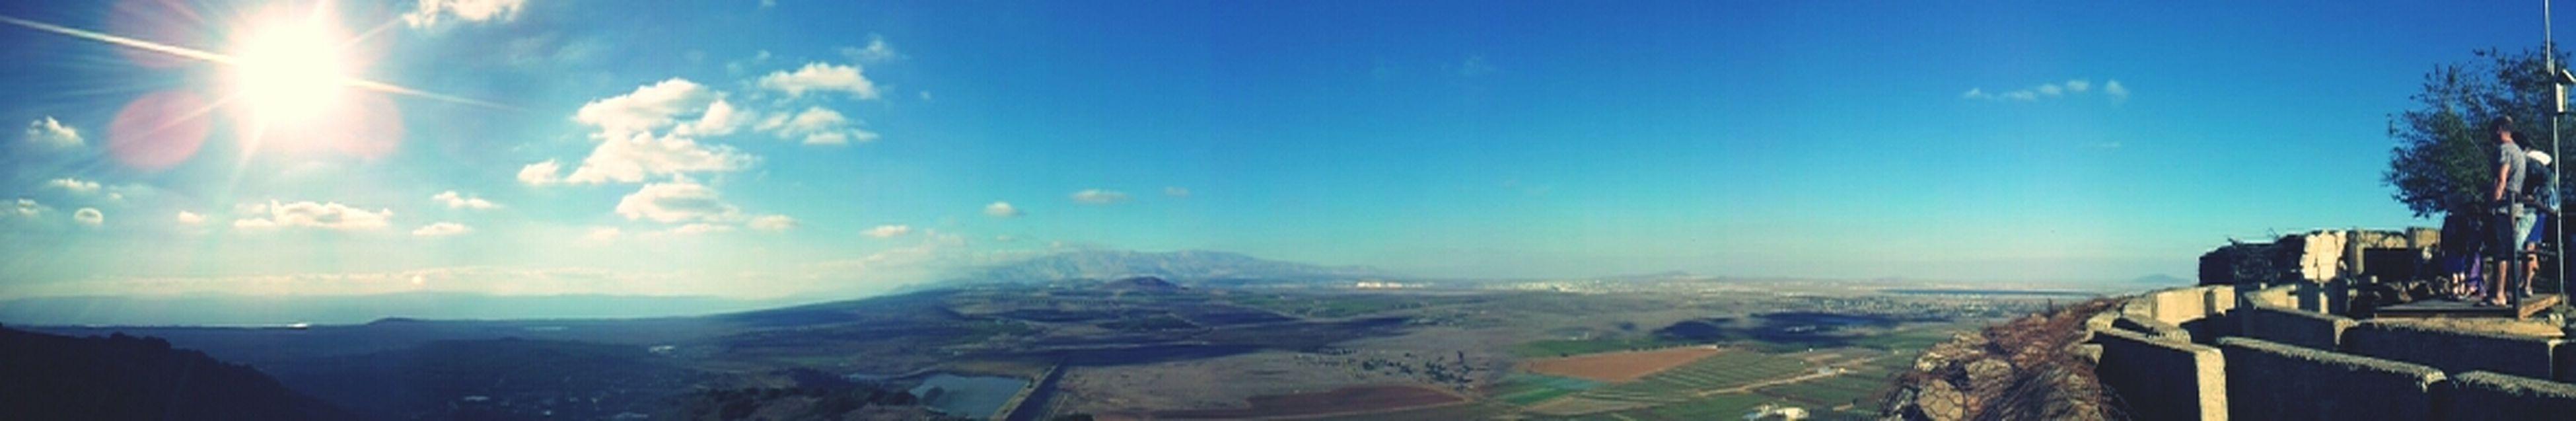 sky, mountain, blue, panoramic, scenics, tranquil scene, tranquility, sunlight, beauty in nature, landscape, nature, cloud - sky, sunbeam, mountain range, sun, cloud, built structure, building exterior, lens flare, architecture